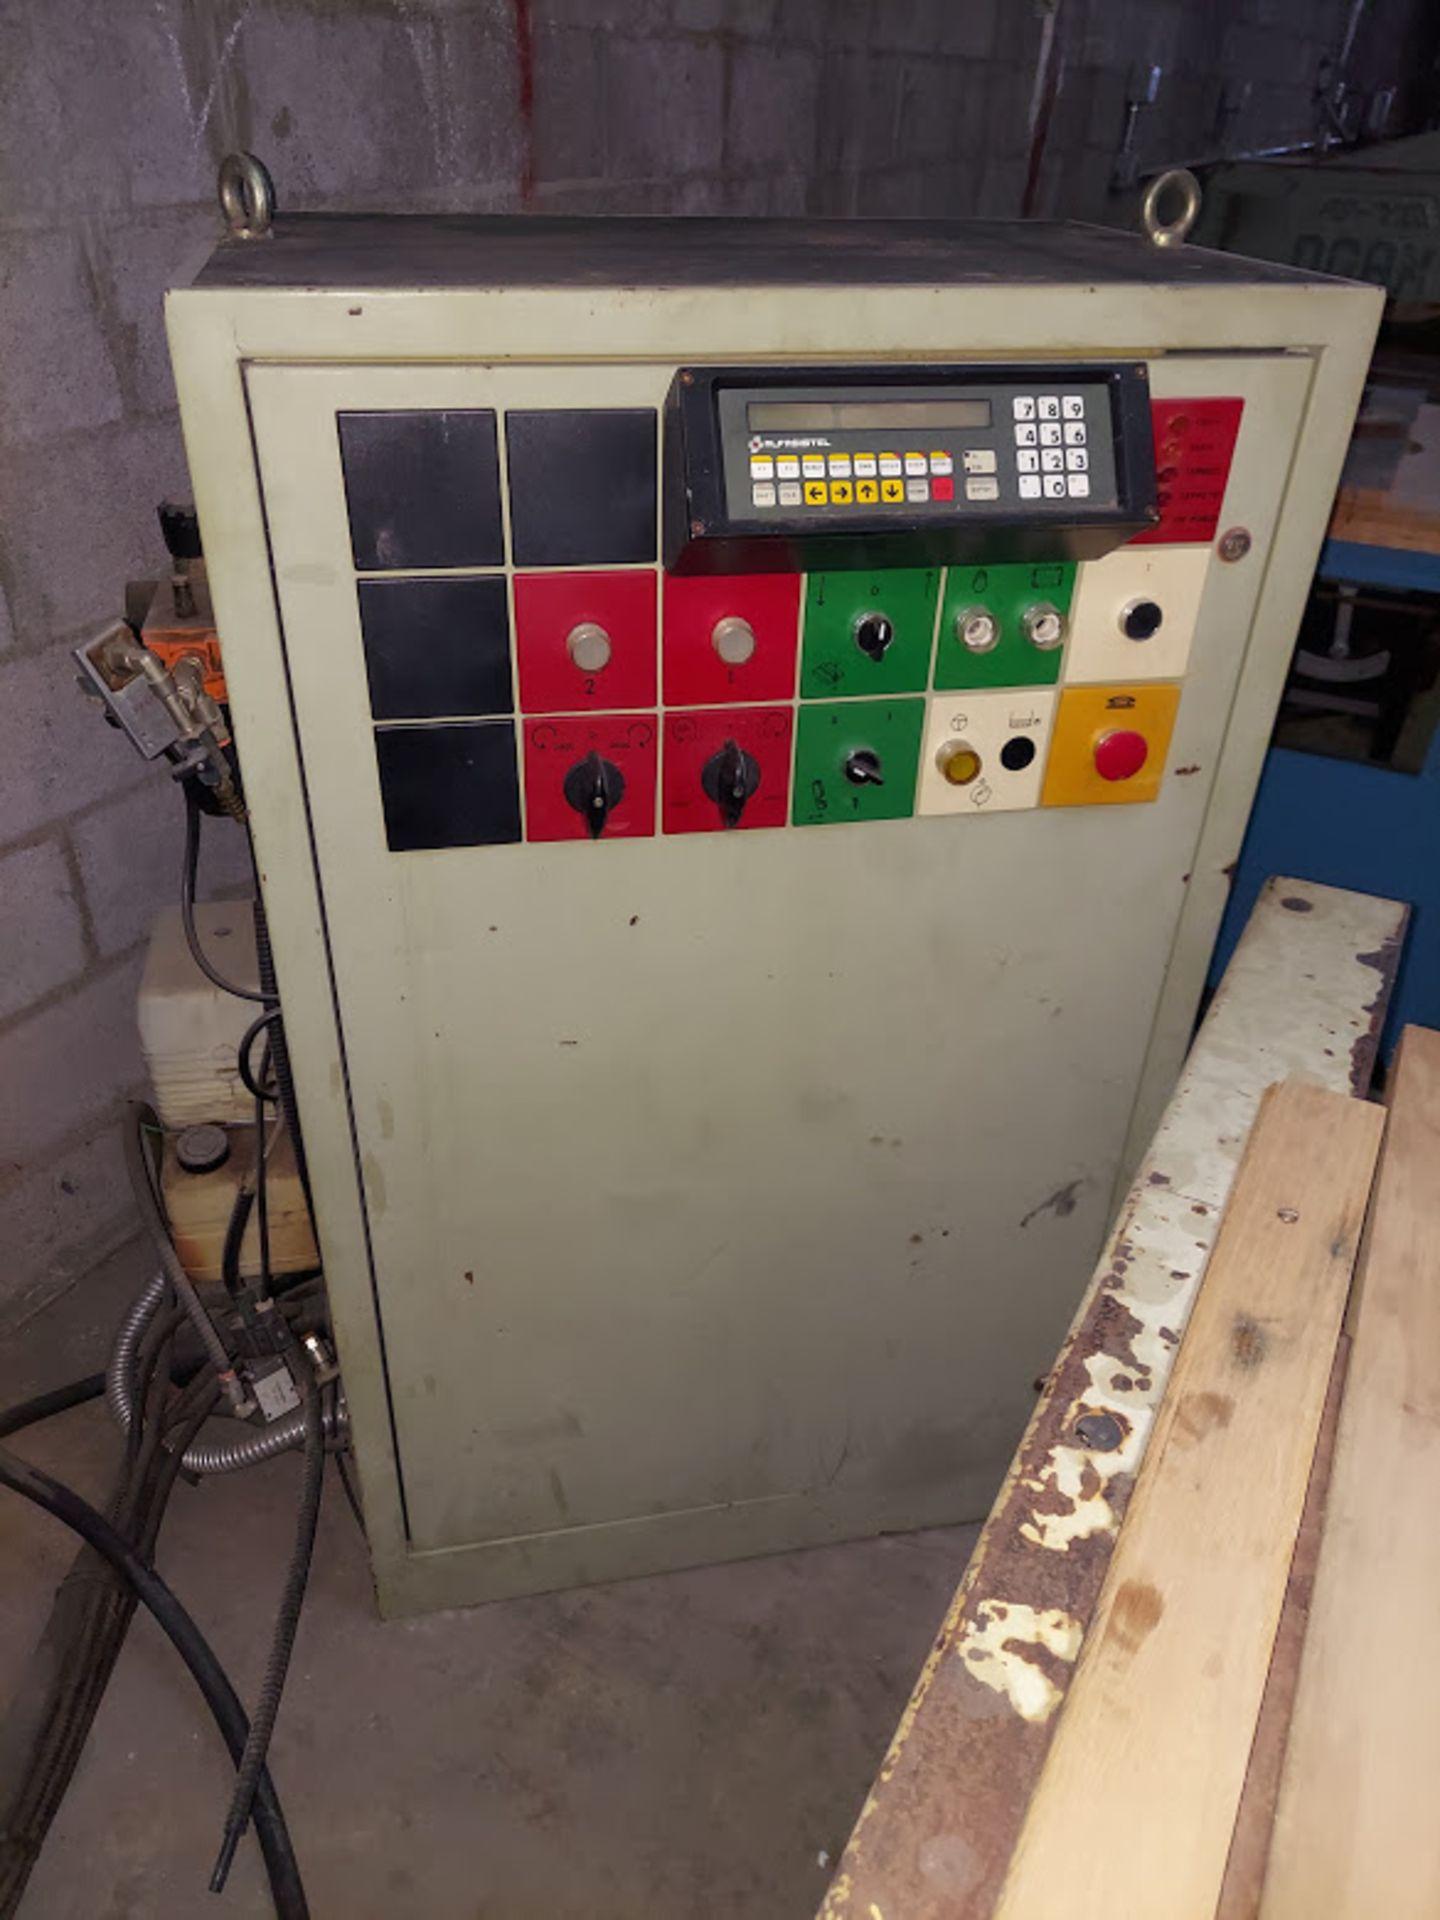 SCMI Center Machine, Model #Center, 1 - Shaper Head 230 Volt 3 Phase, Sanding Station, Power Feed - Image 7 of 7